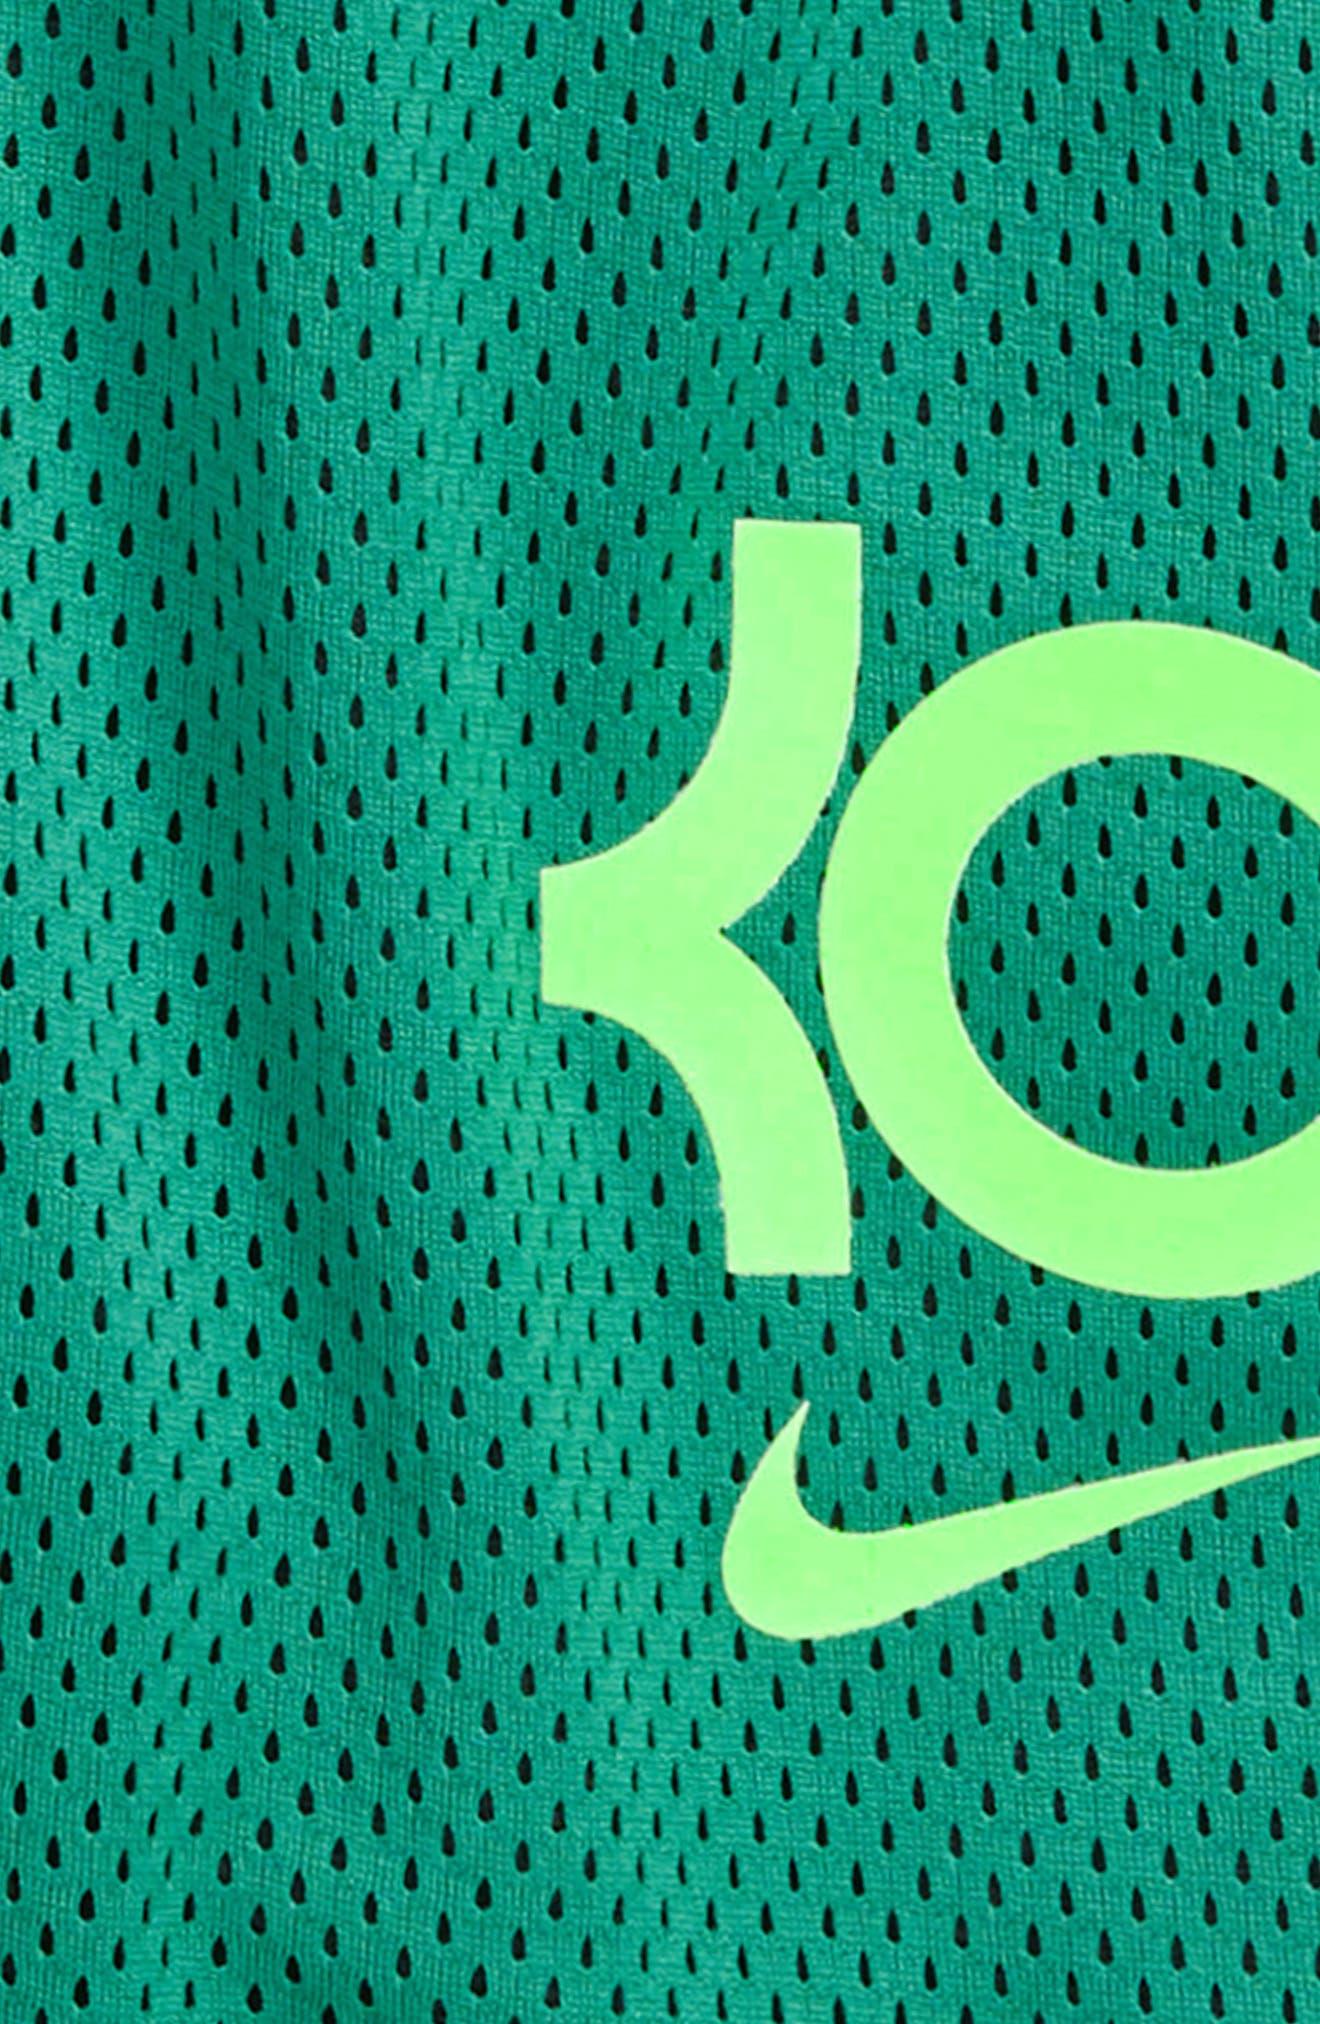 KD GFX Shorts,                             Alternate thumbnail 2, color,                             Green Noise/ Green Strike